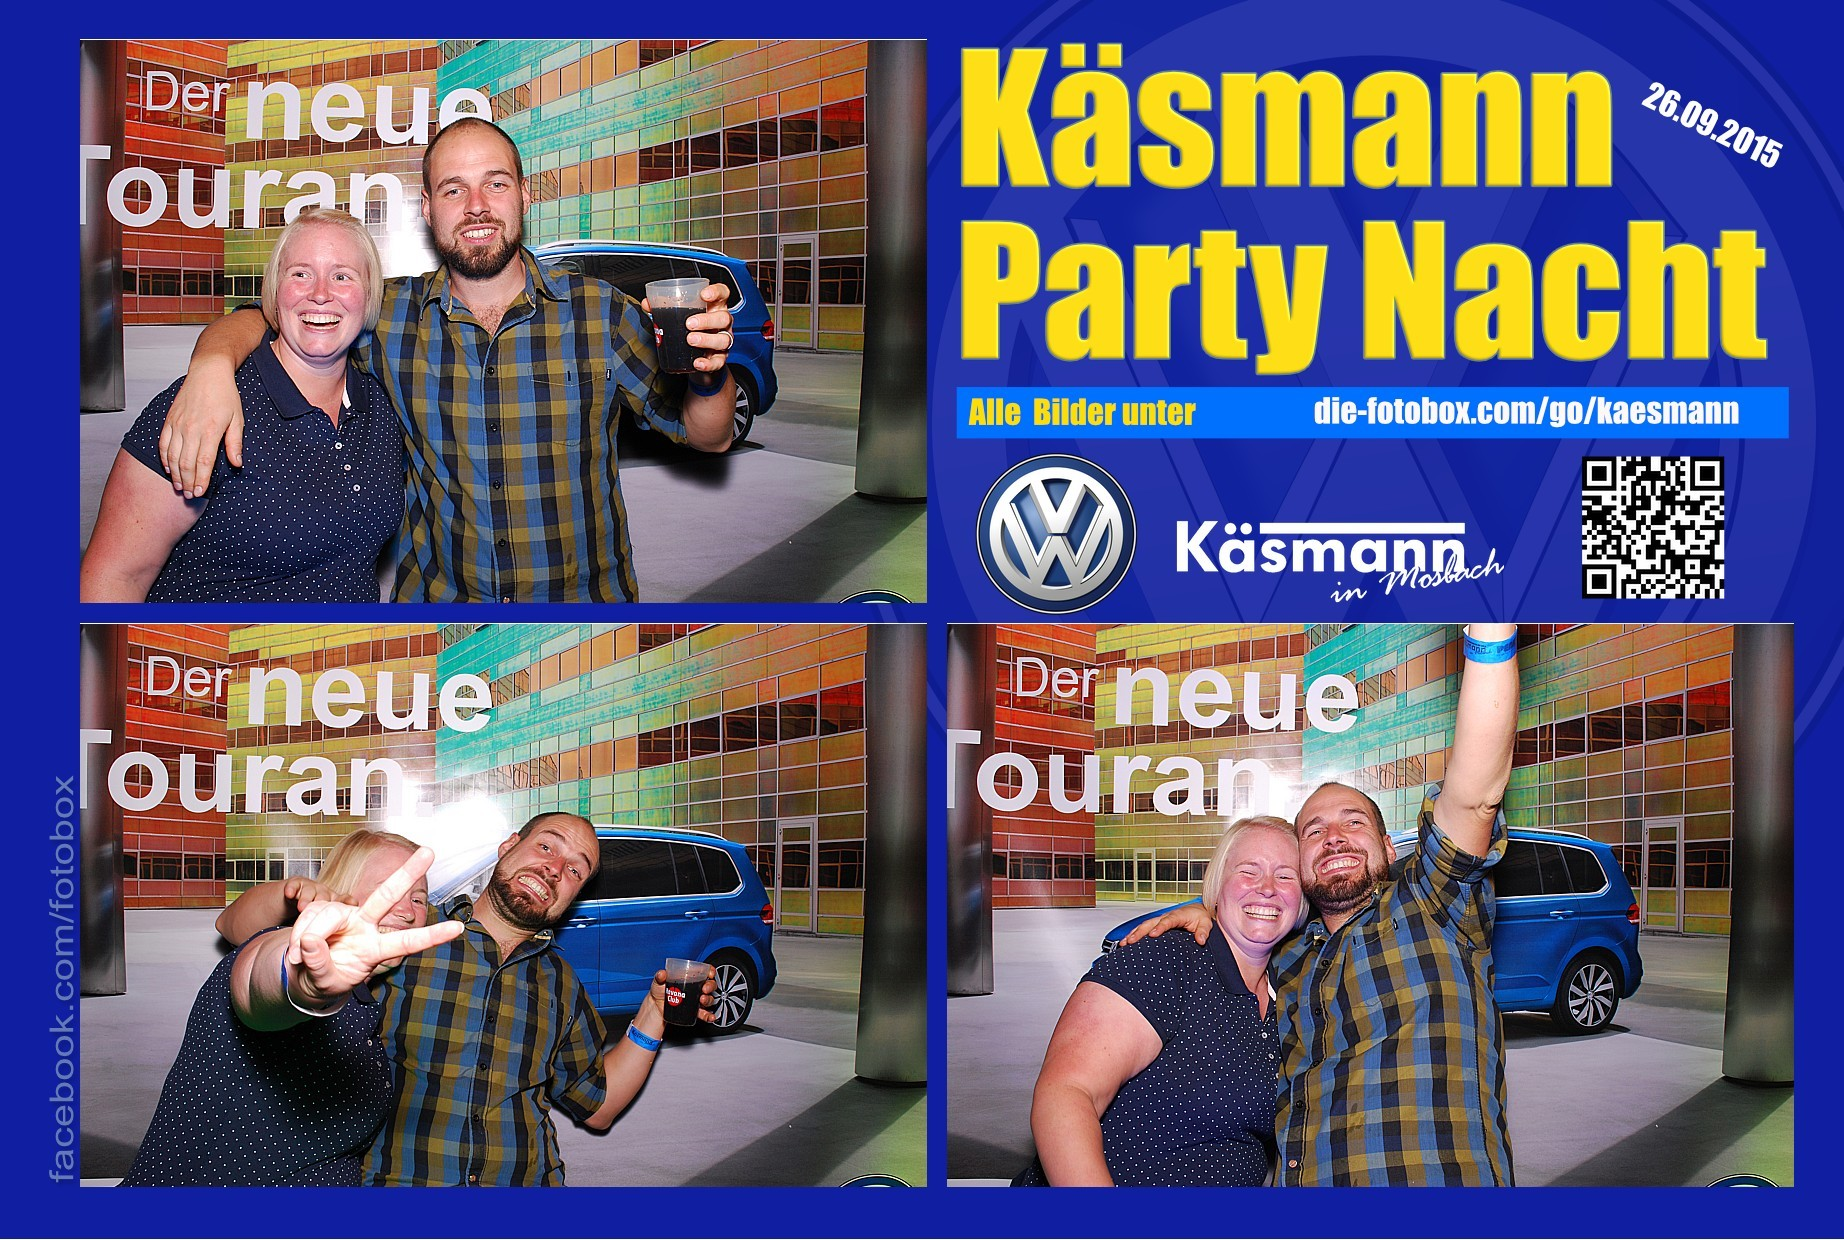 Käsmannparty 2015 - www.die-fotobox.com 00916